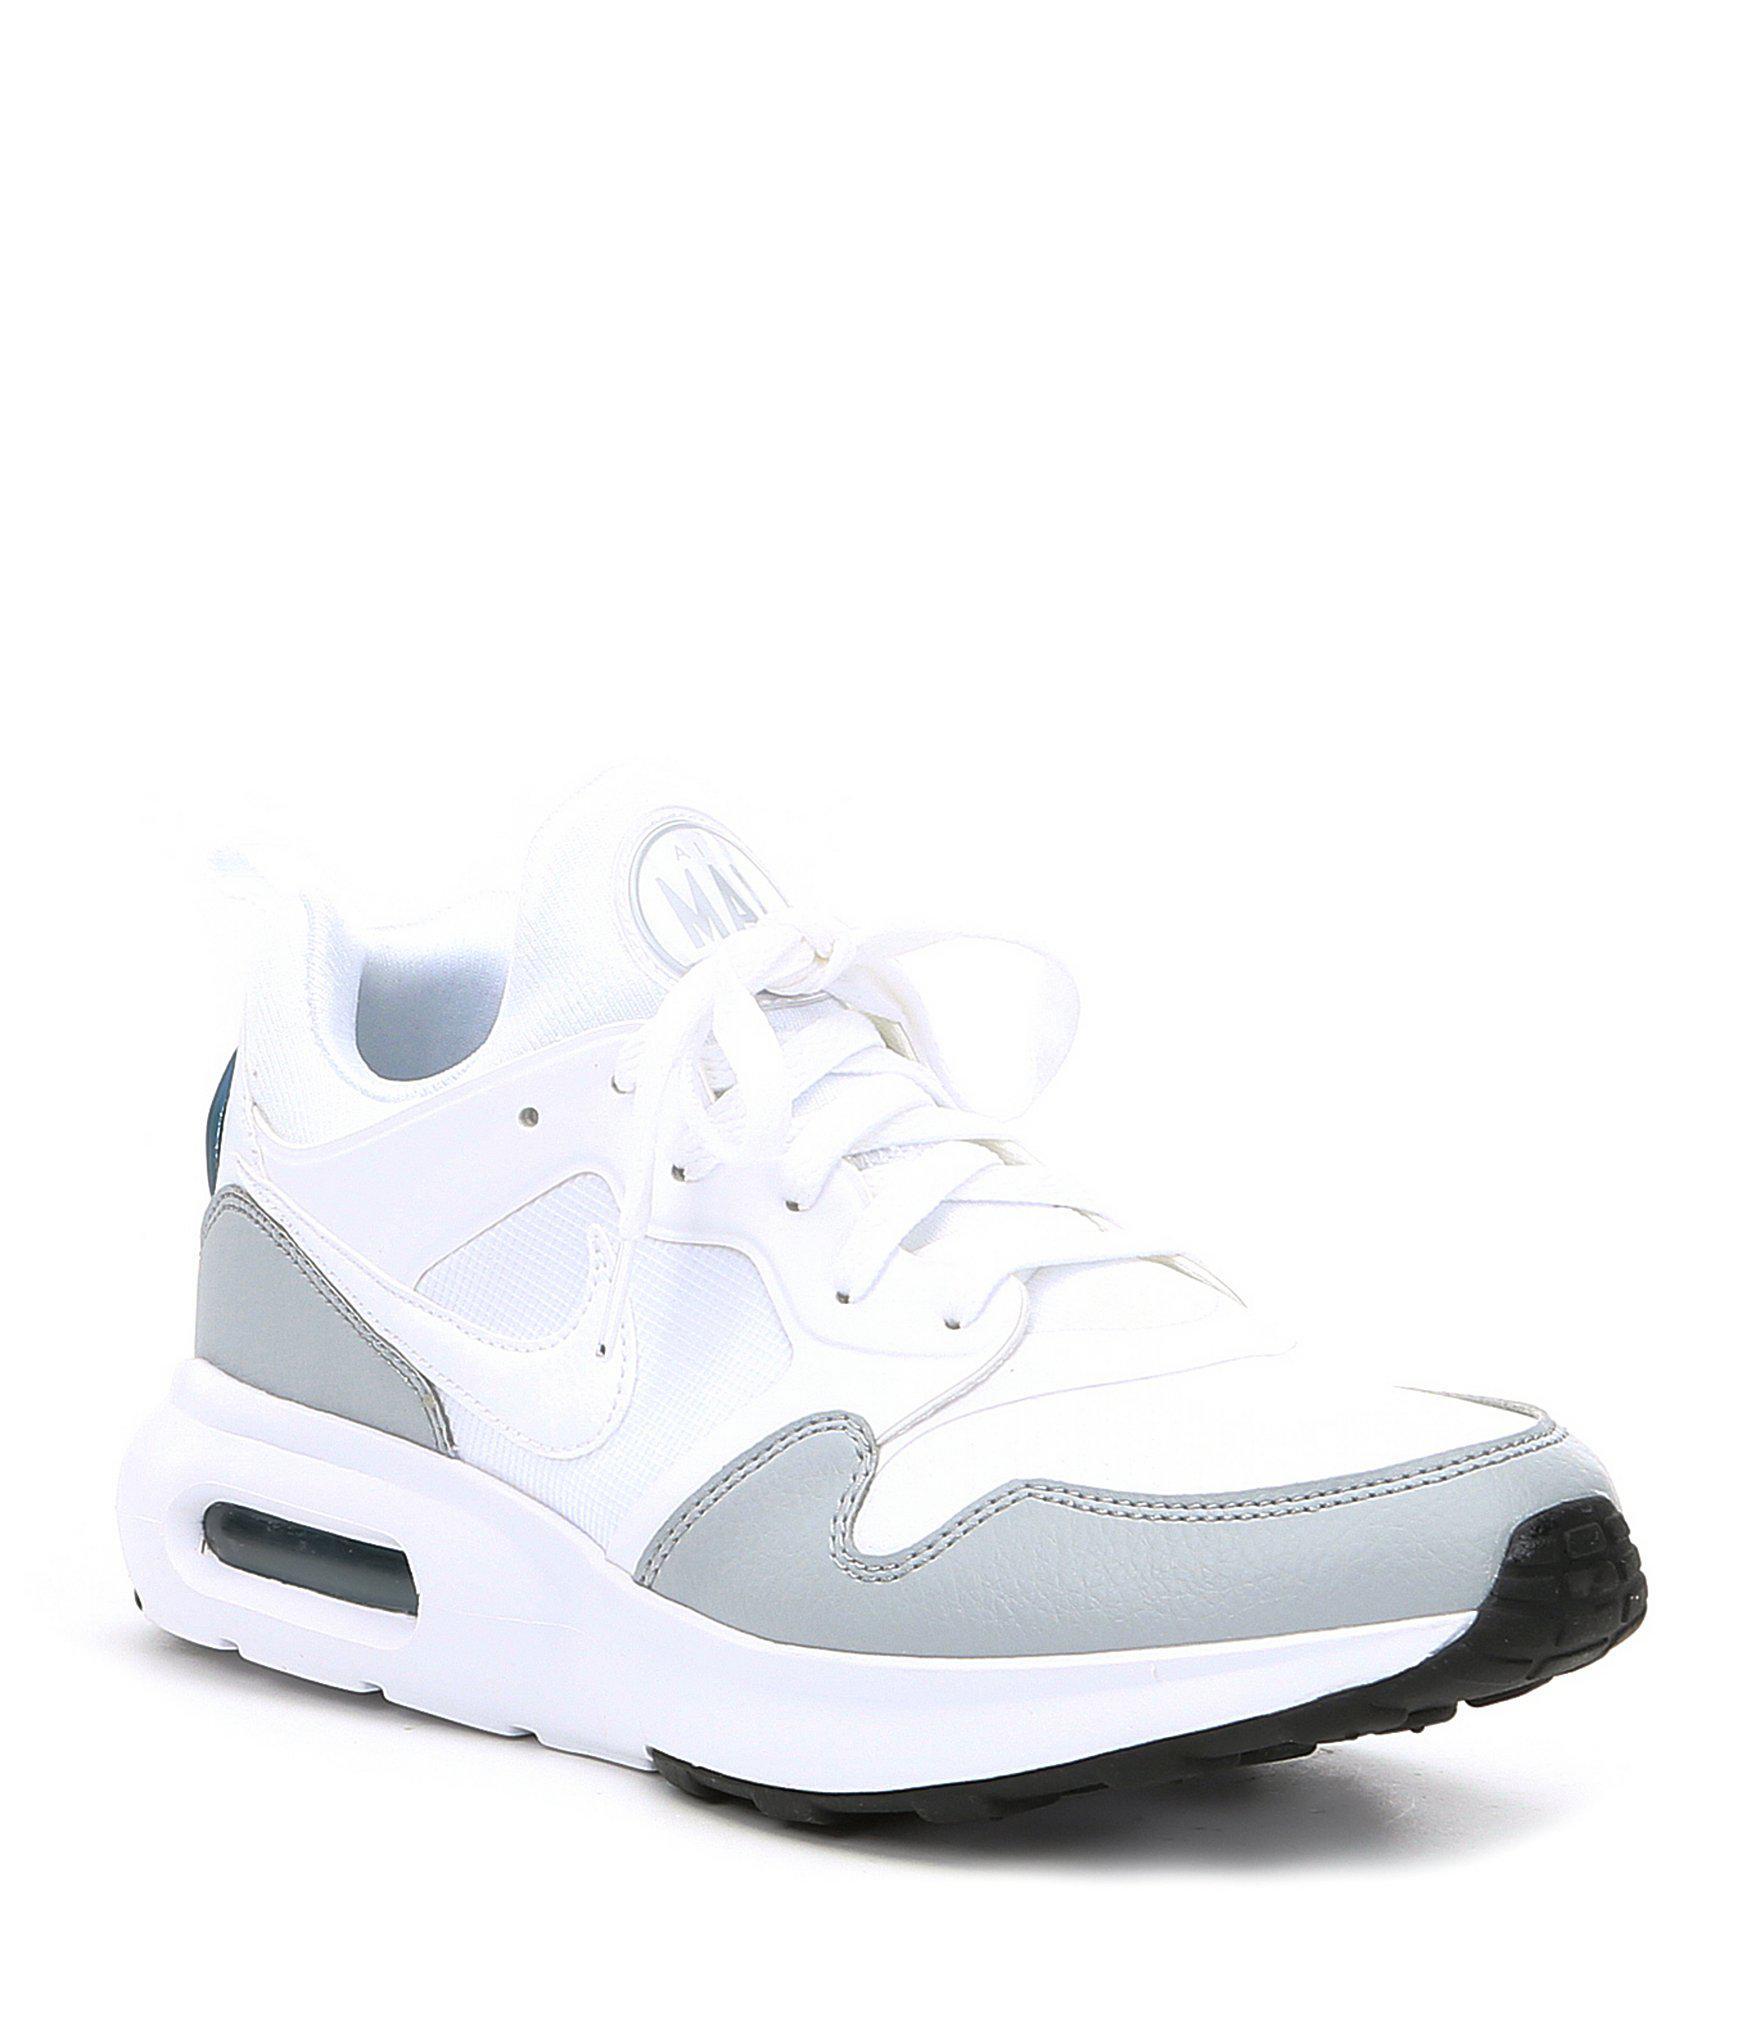 wholesale dealer 10816 1d0bf australia nike huarache white white f71ee 884a6  low cost nike. white mens  air 4d6e7 21628